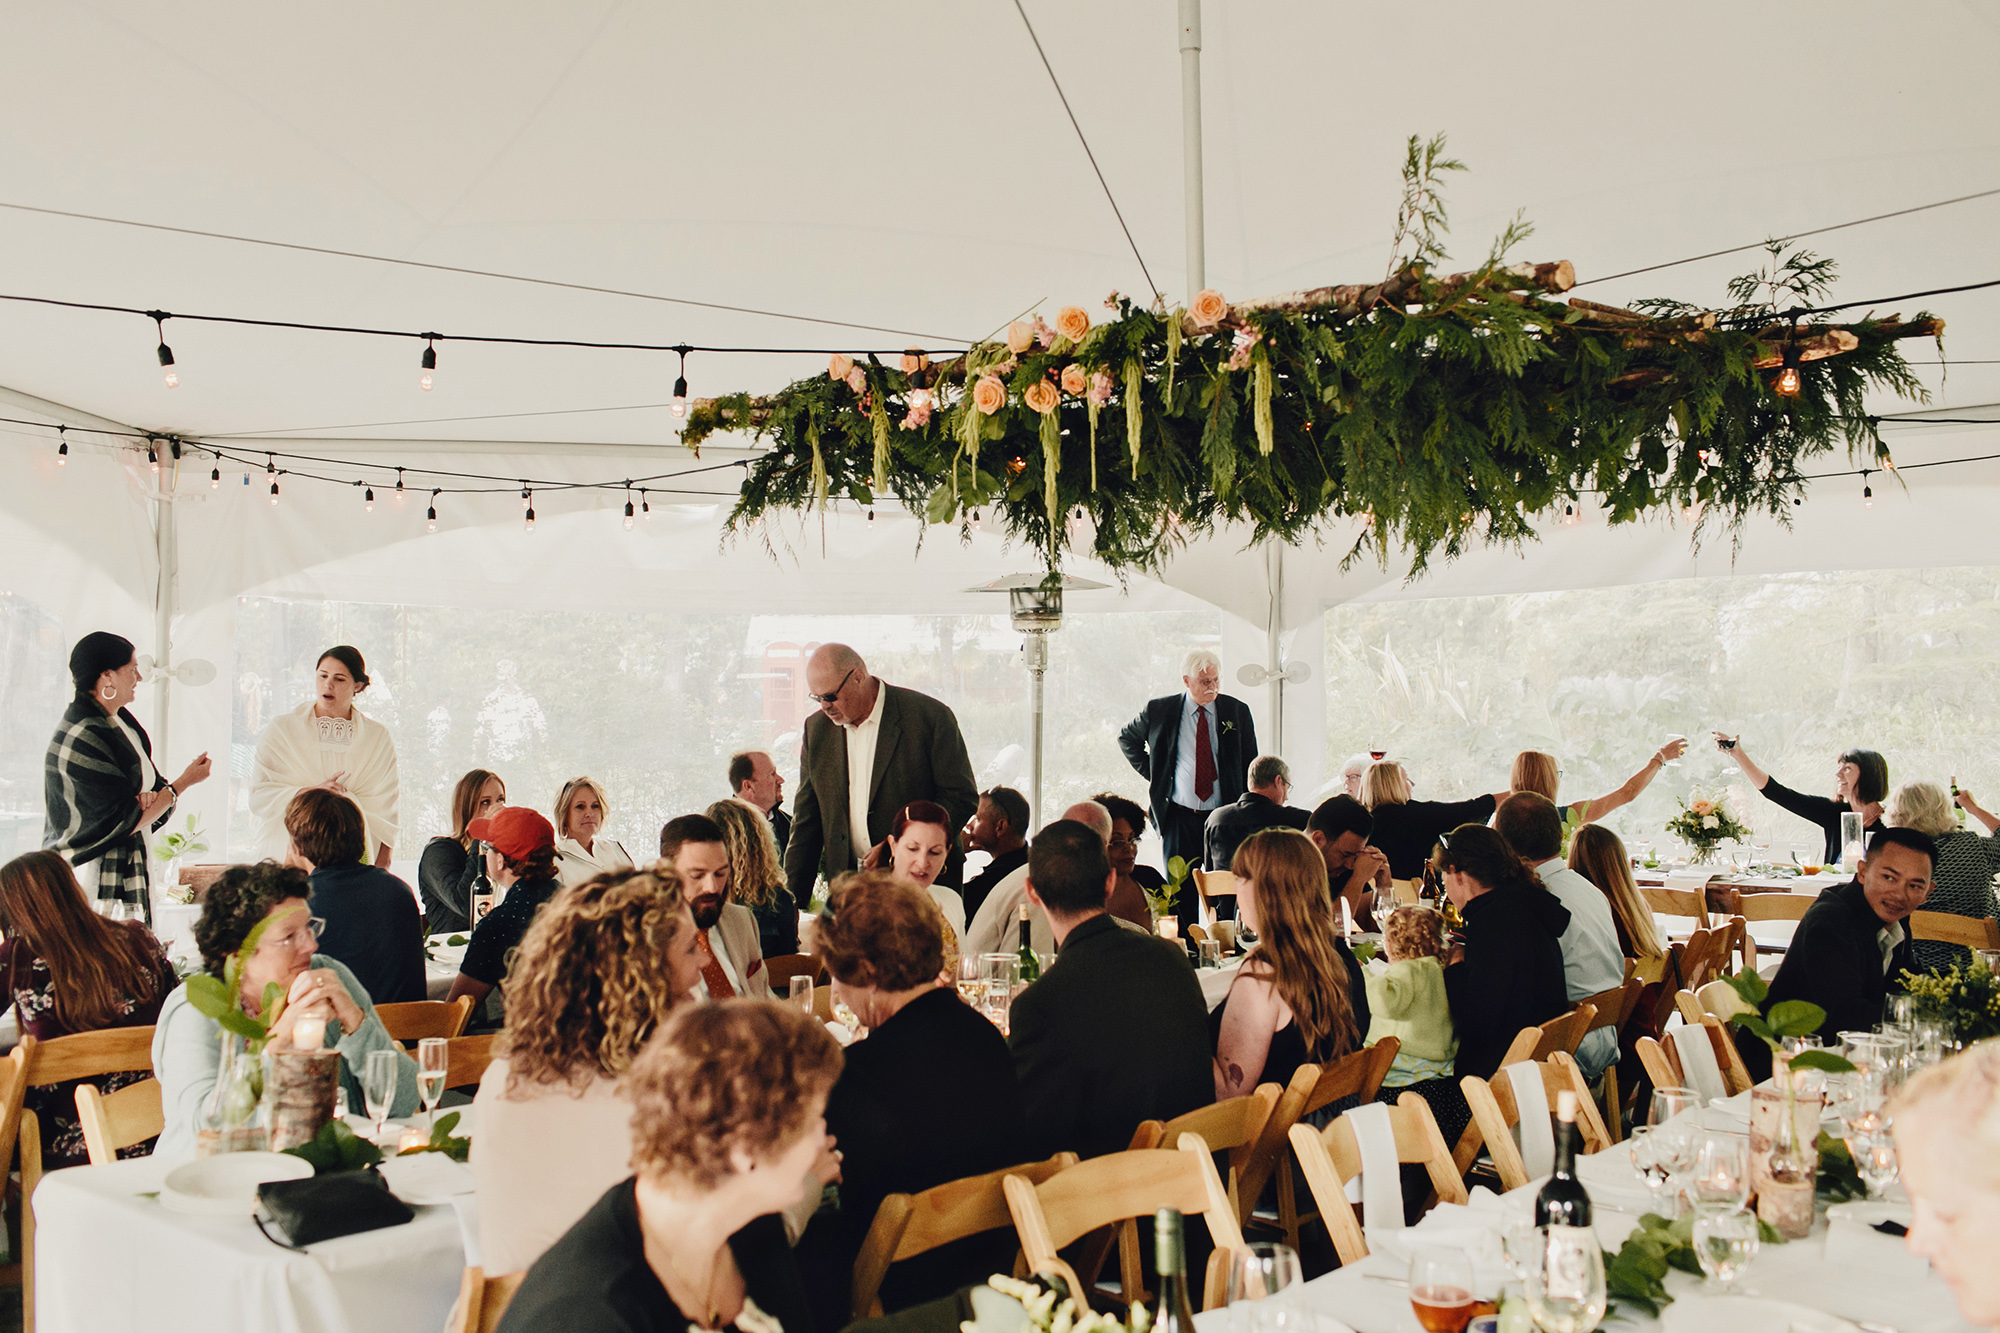 Tofino-Botanical-Gardens-Wedding-Photos-0122.jpg